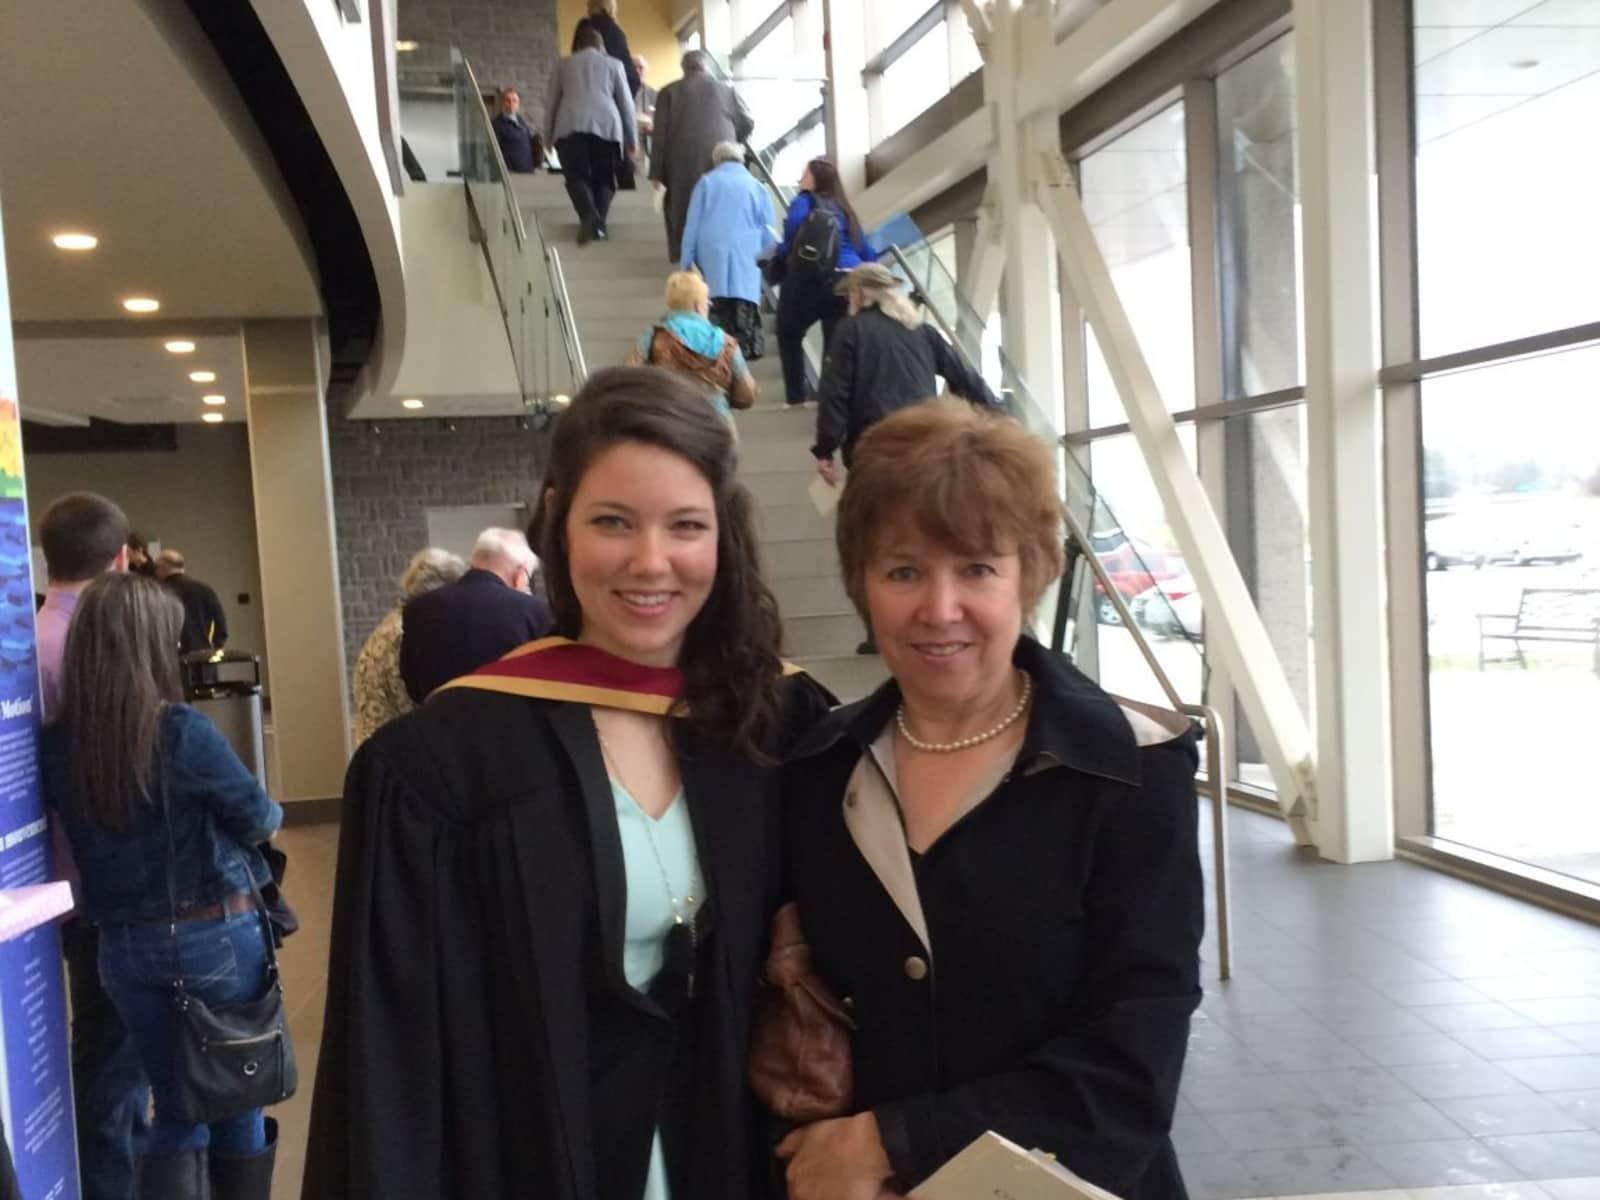 Julie & Sister, helen from Lindsay, Ontario, Canada